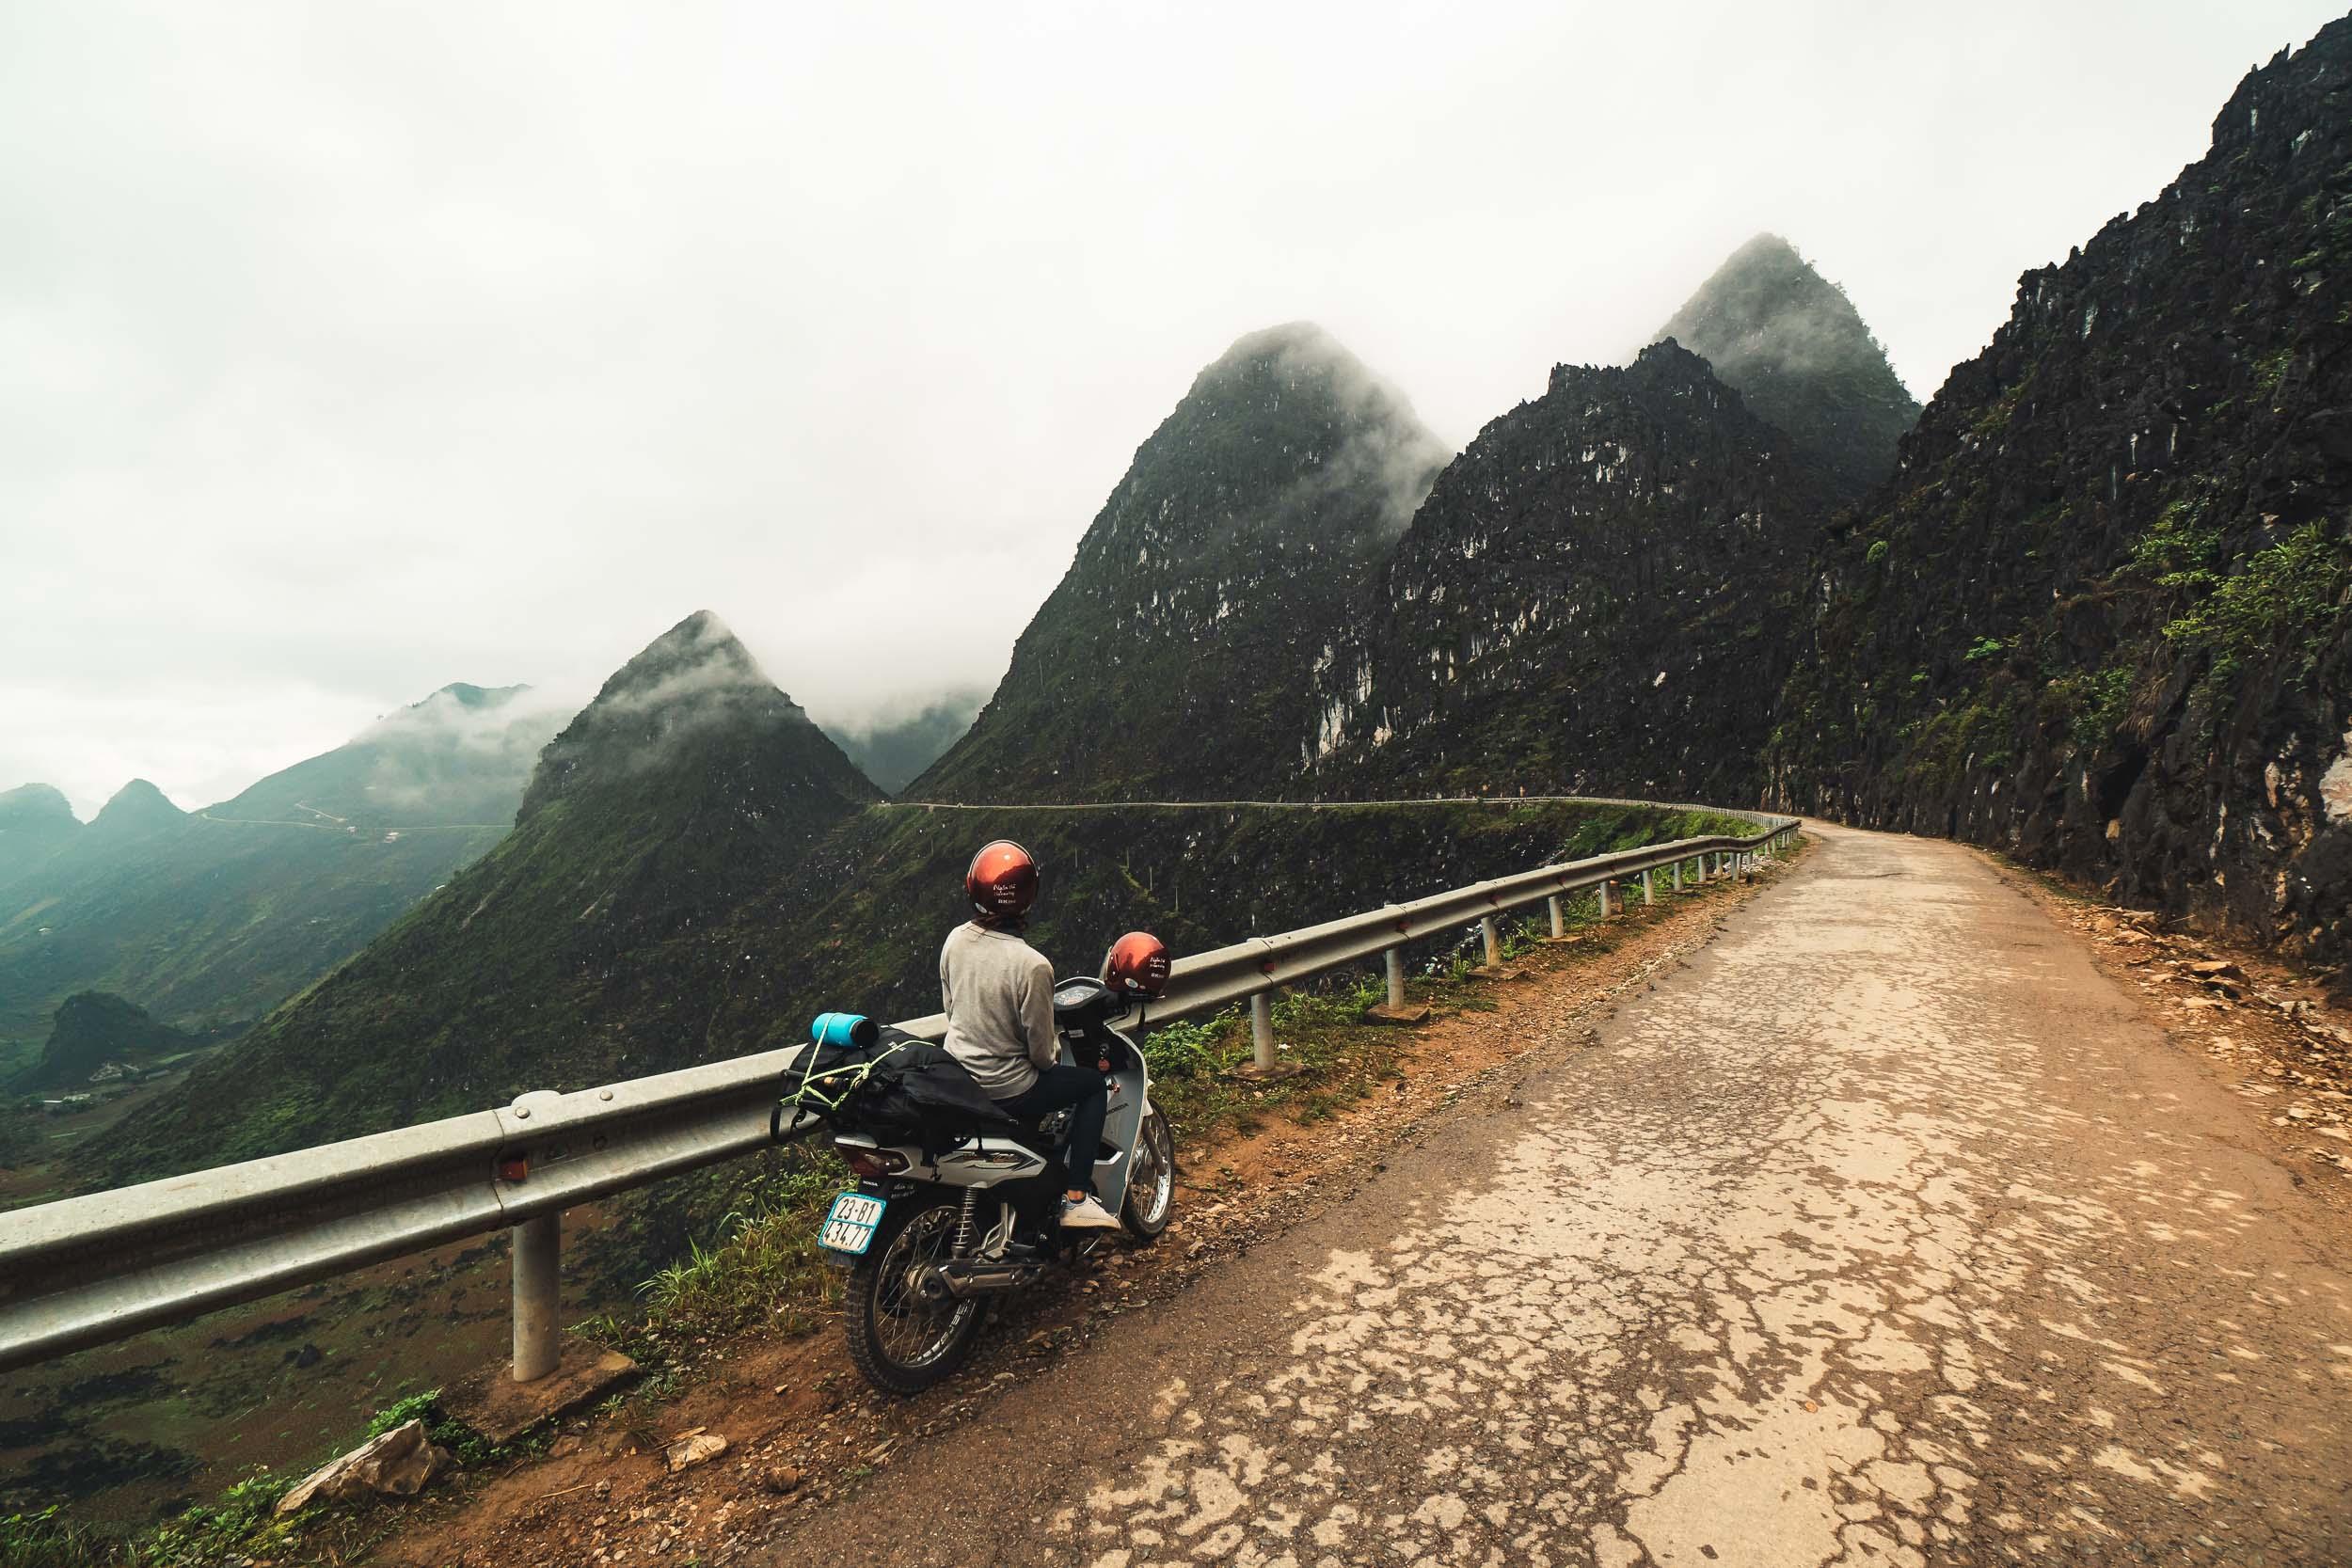 ha_giang_motorbike.jpg